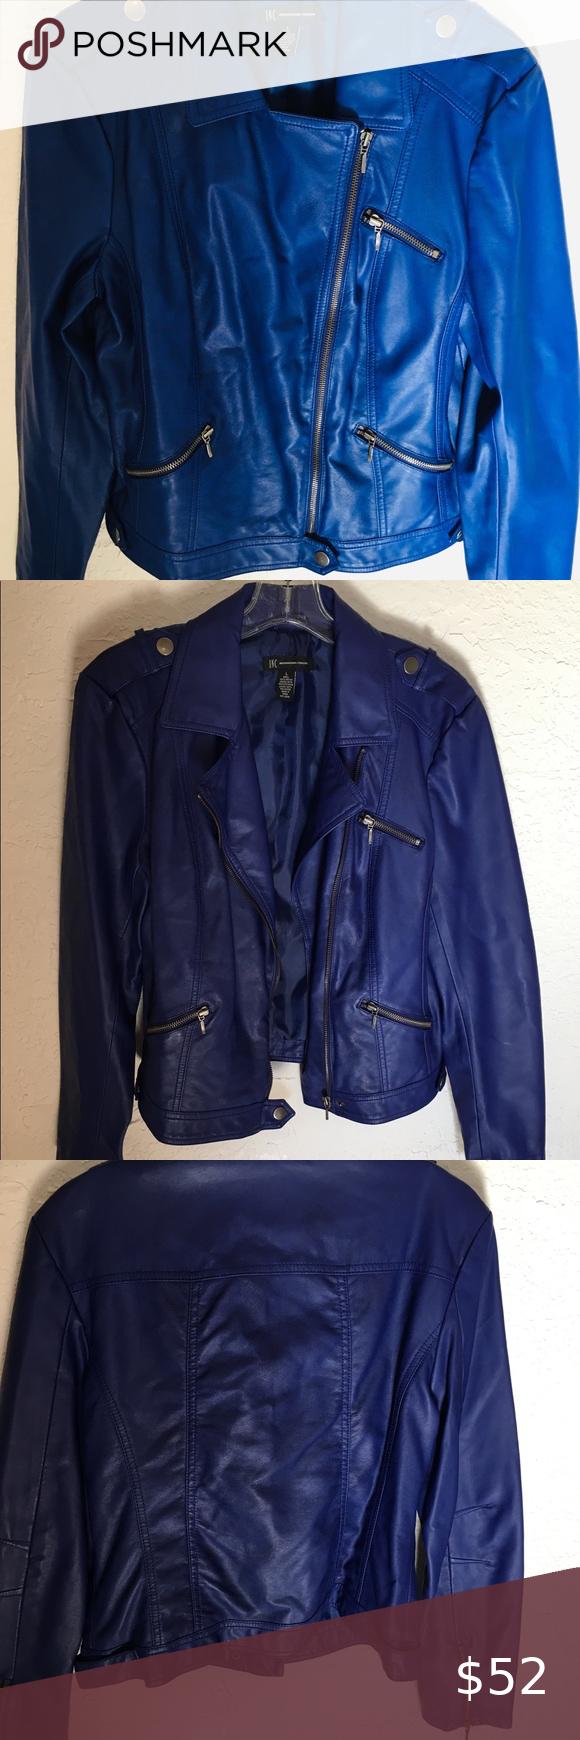 Inc International Royal Blue Faux Leather Jacket L Vegan Leather Jacket Leather Jacket Faux Leather Jackets [ 1740 x 580 Pixel ]